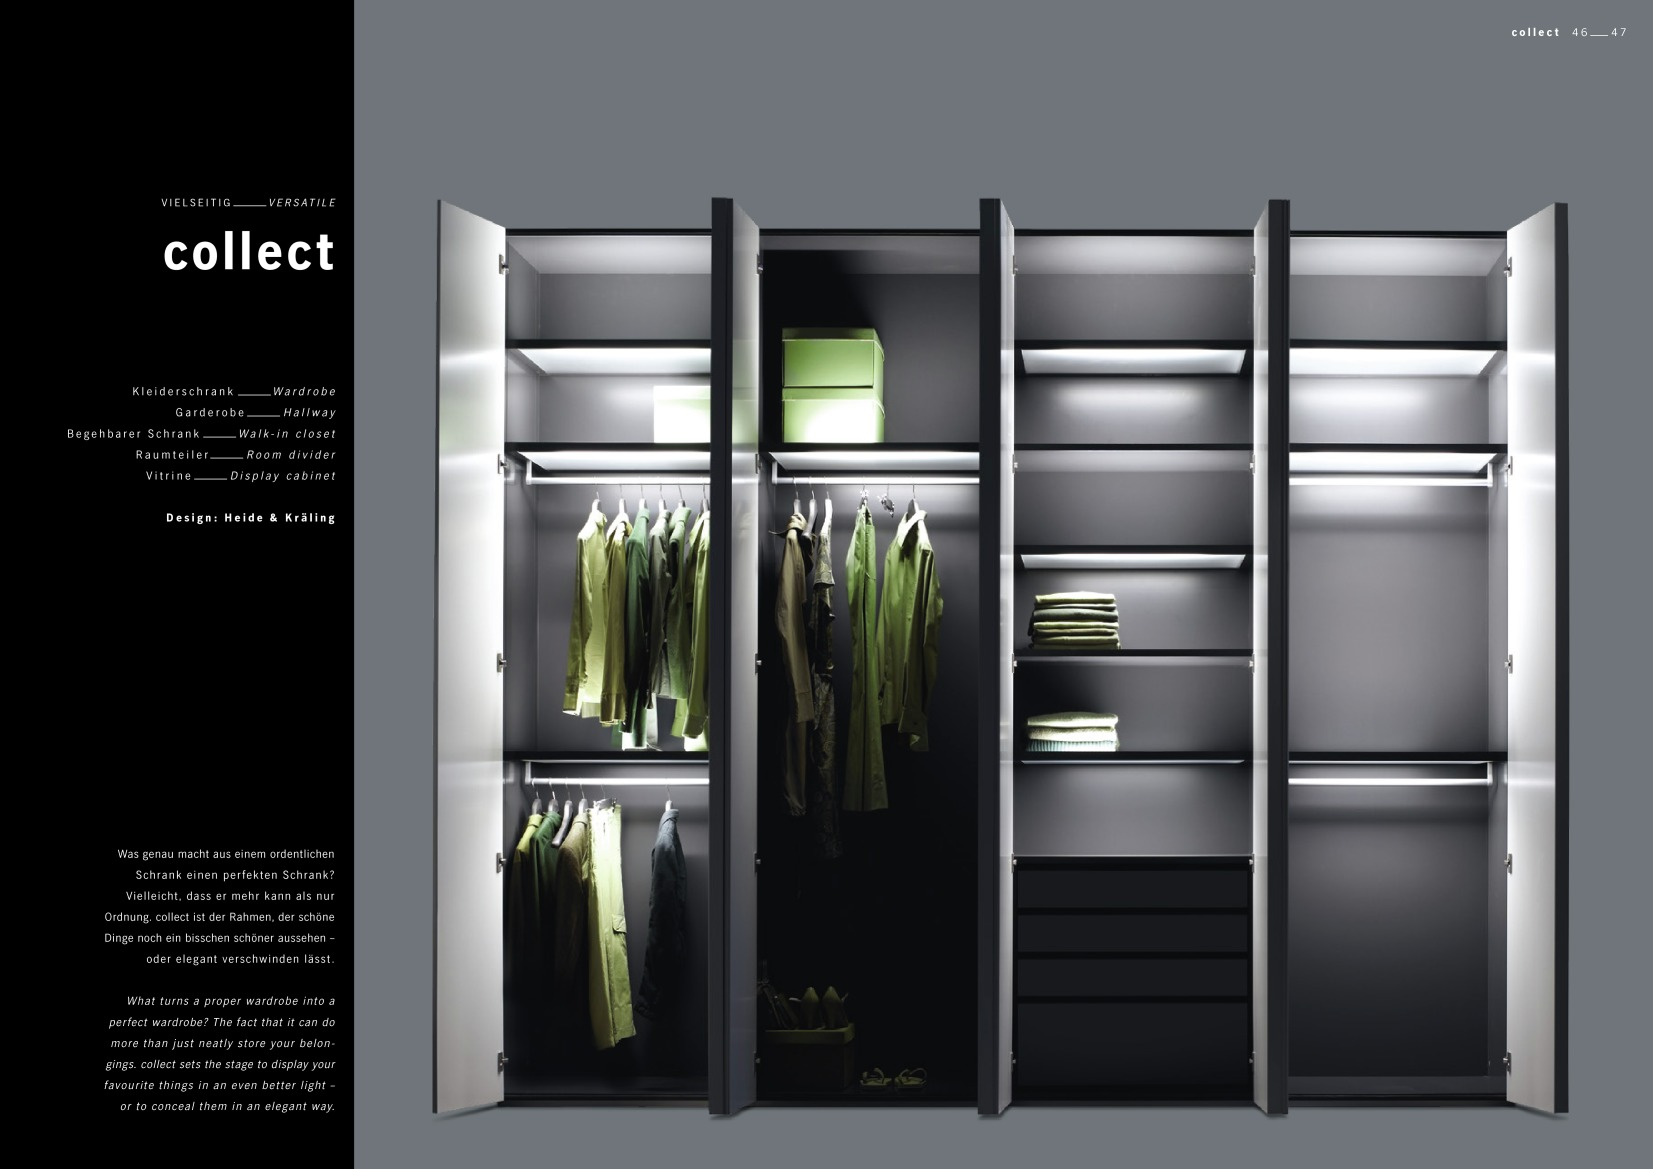 interluebke lookbook 2017 gs 22 m bel weber neustadt landau karlsruhe. Black Bedroom Furniture Sets. Home Design Ideas